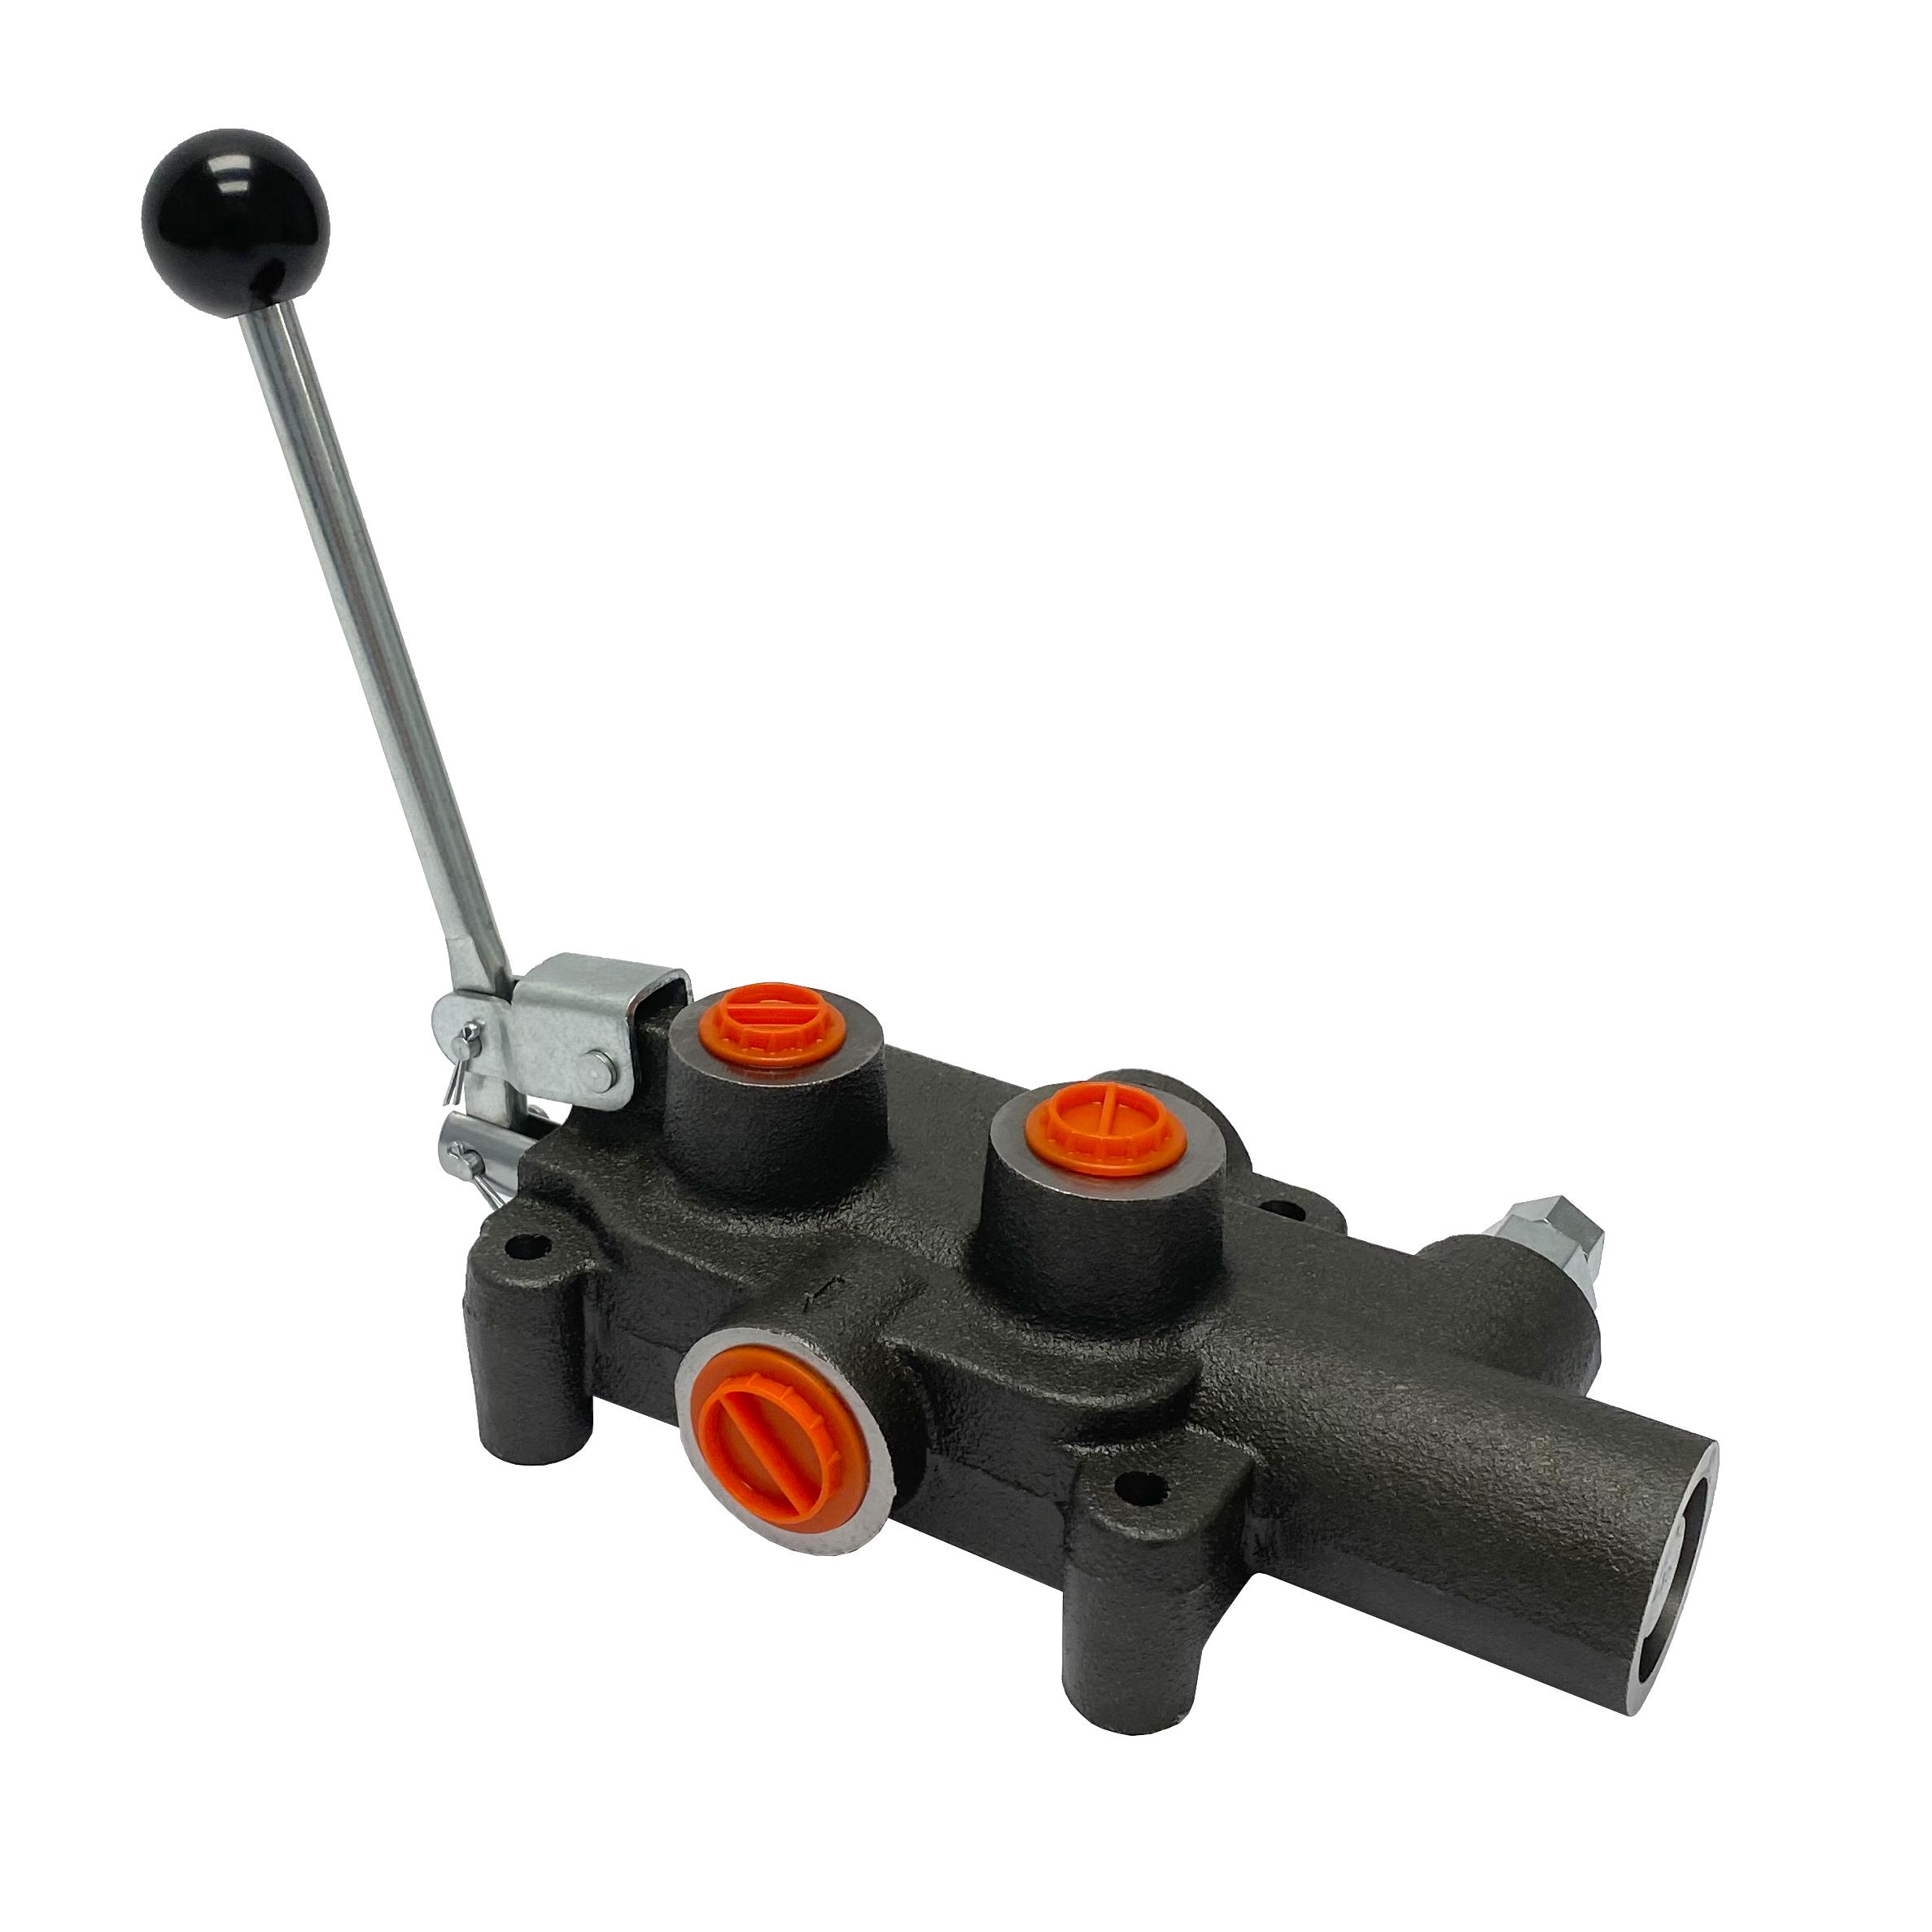 1 spool x 21 GPM hydraulic log splitter control valve, monoblock cast iron valve   Magister Hydraulics